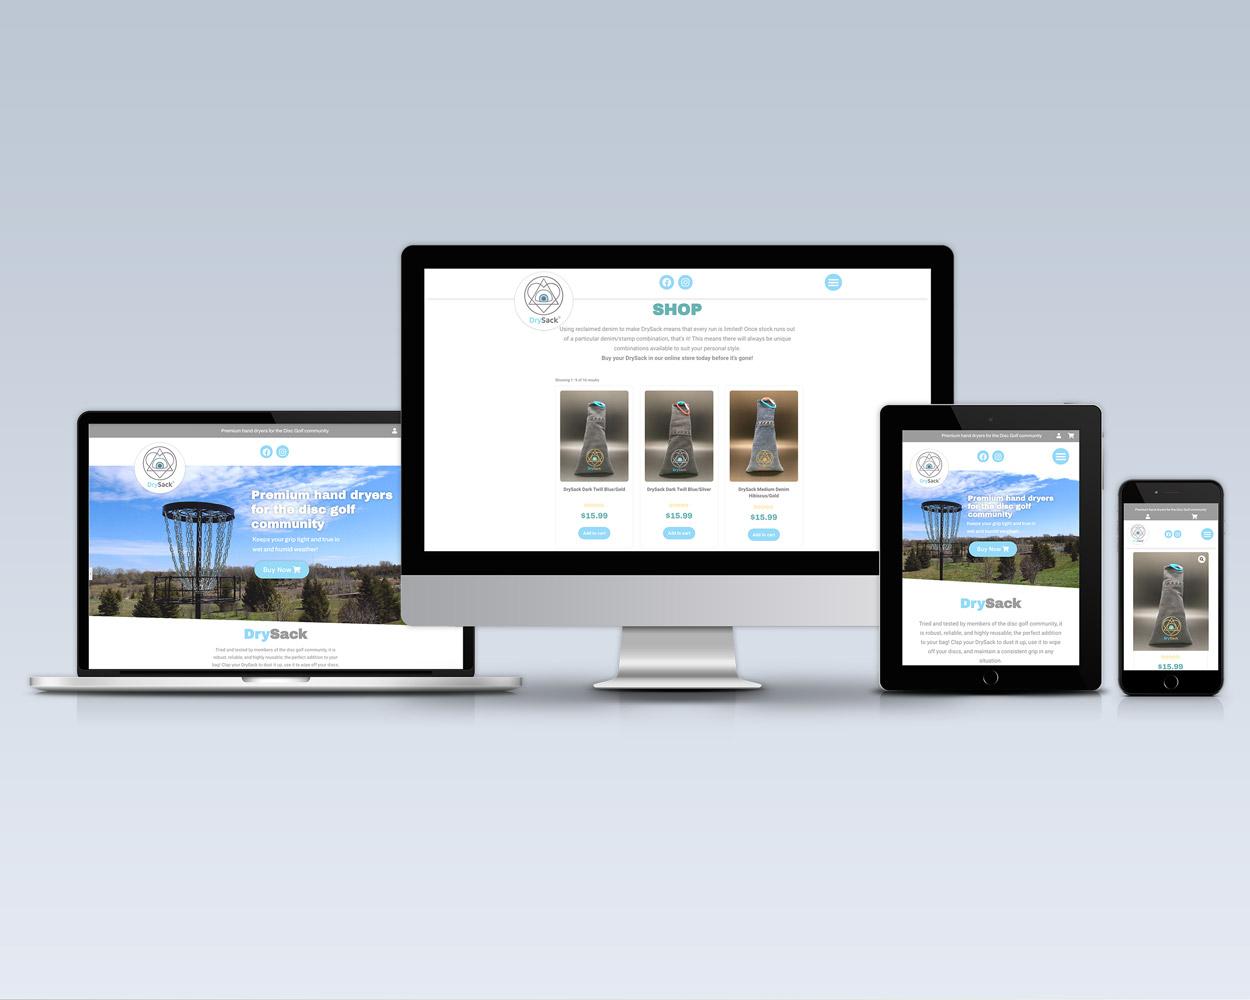 drysack black bike media ecommerce webshop sell Guelph online